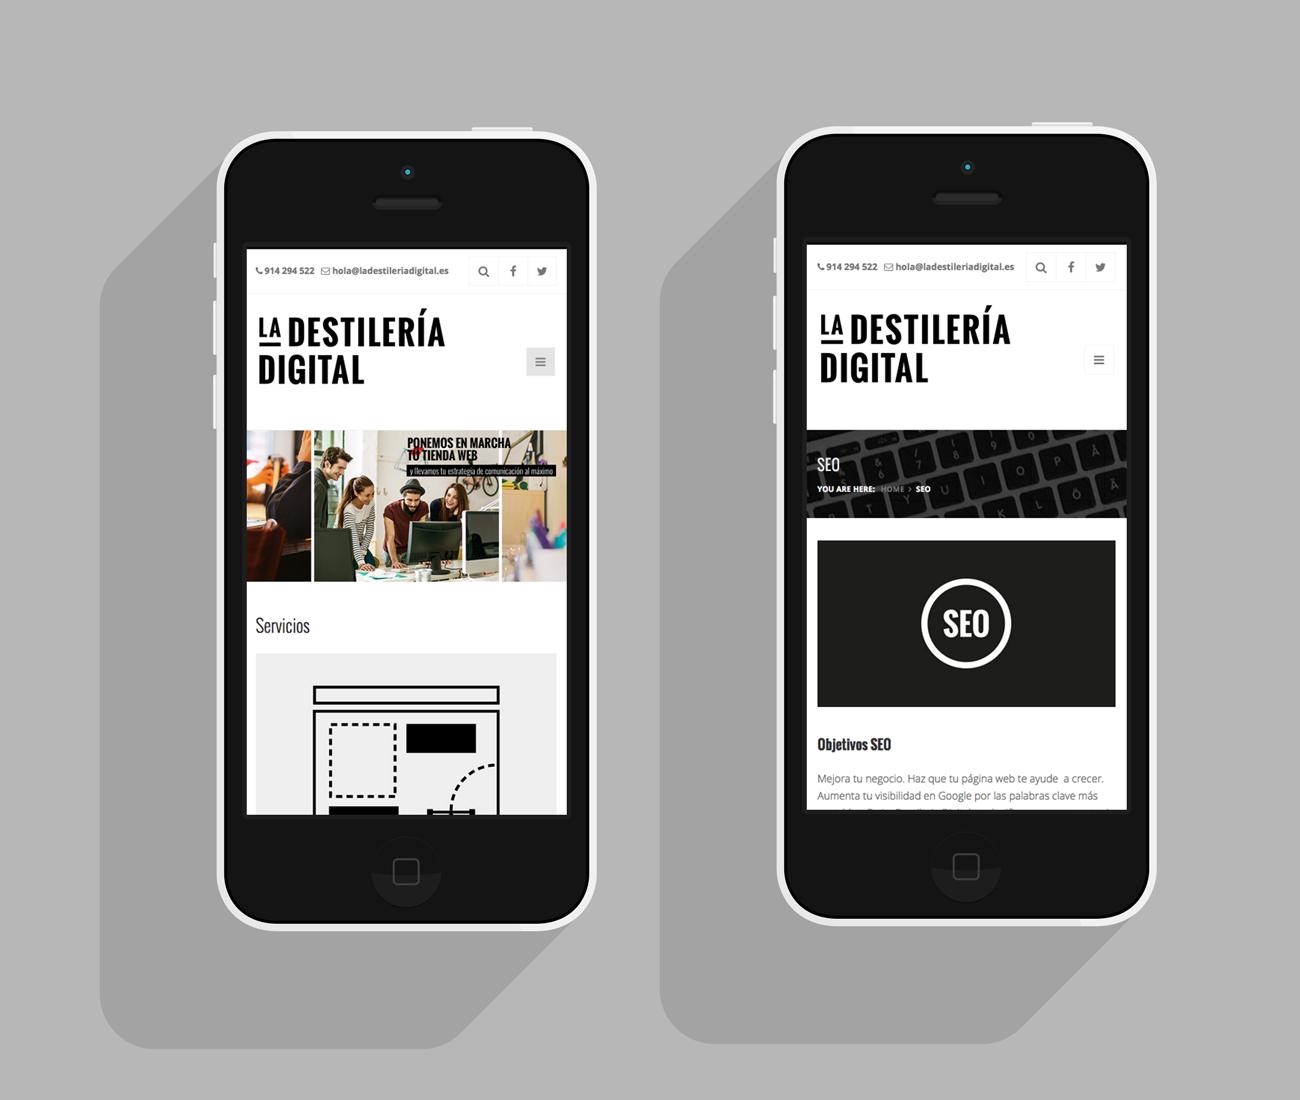 la-destileria-digital-web-mockup03.png